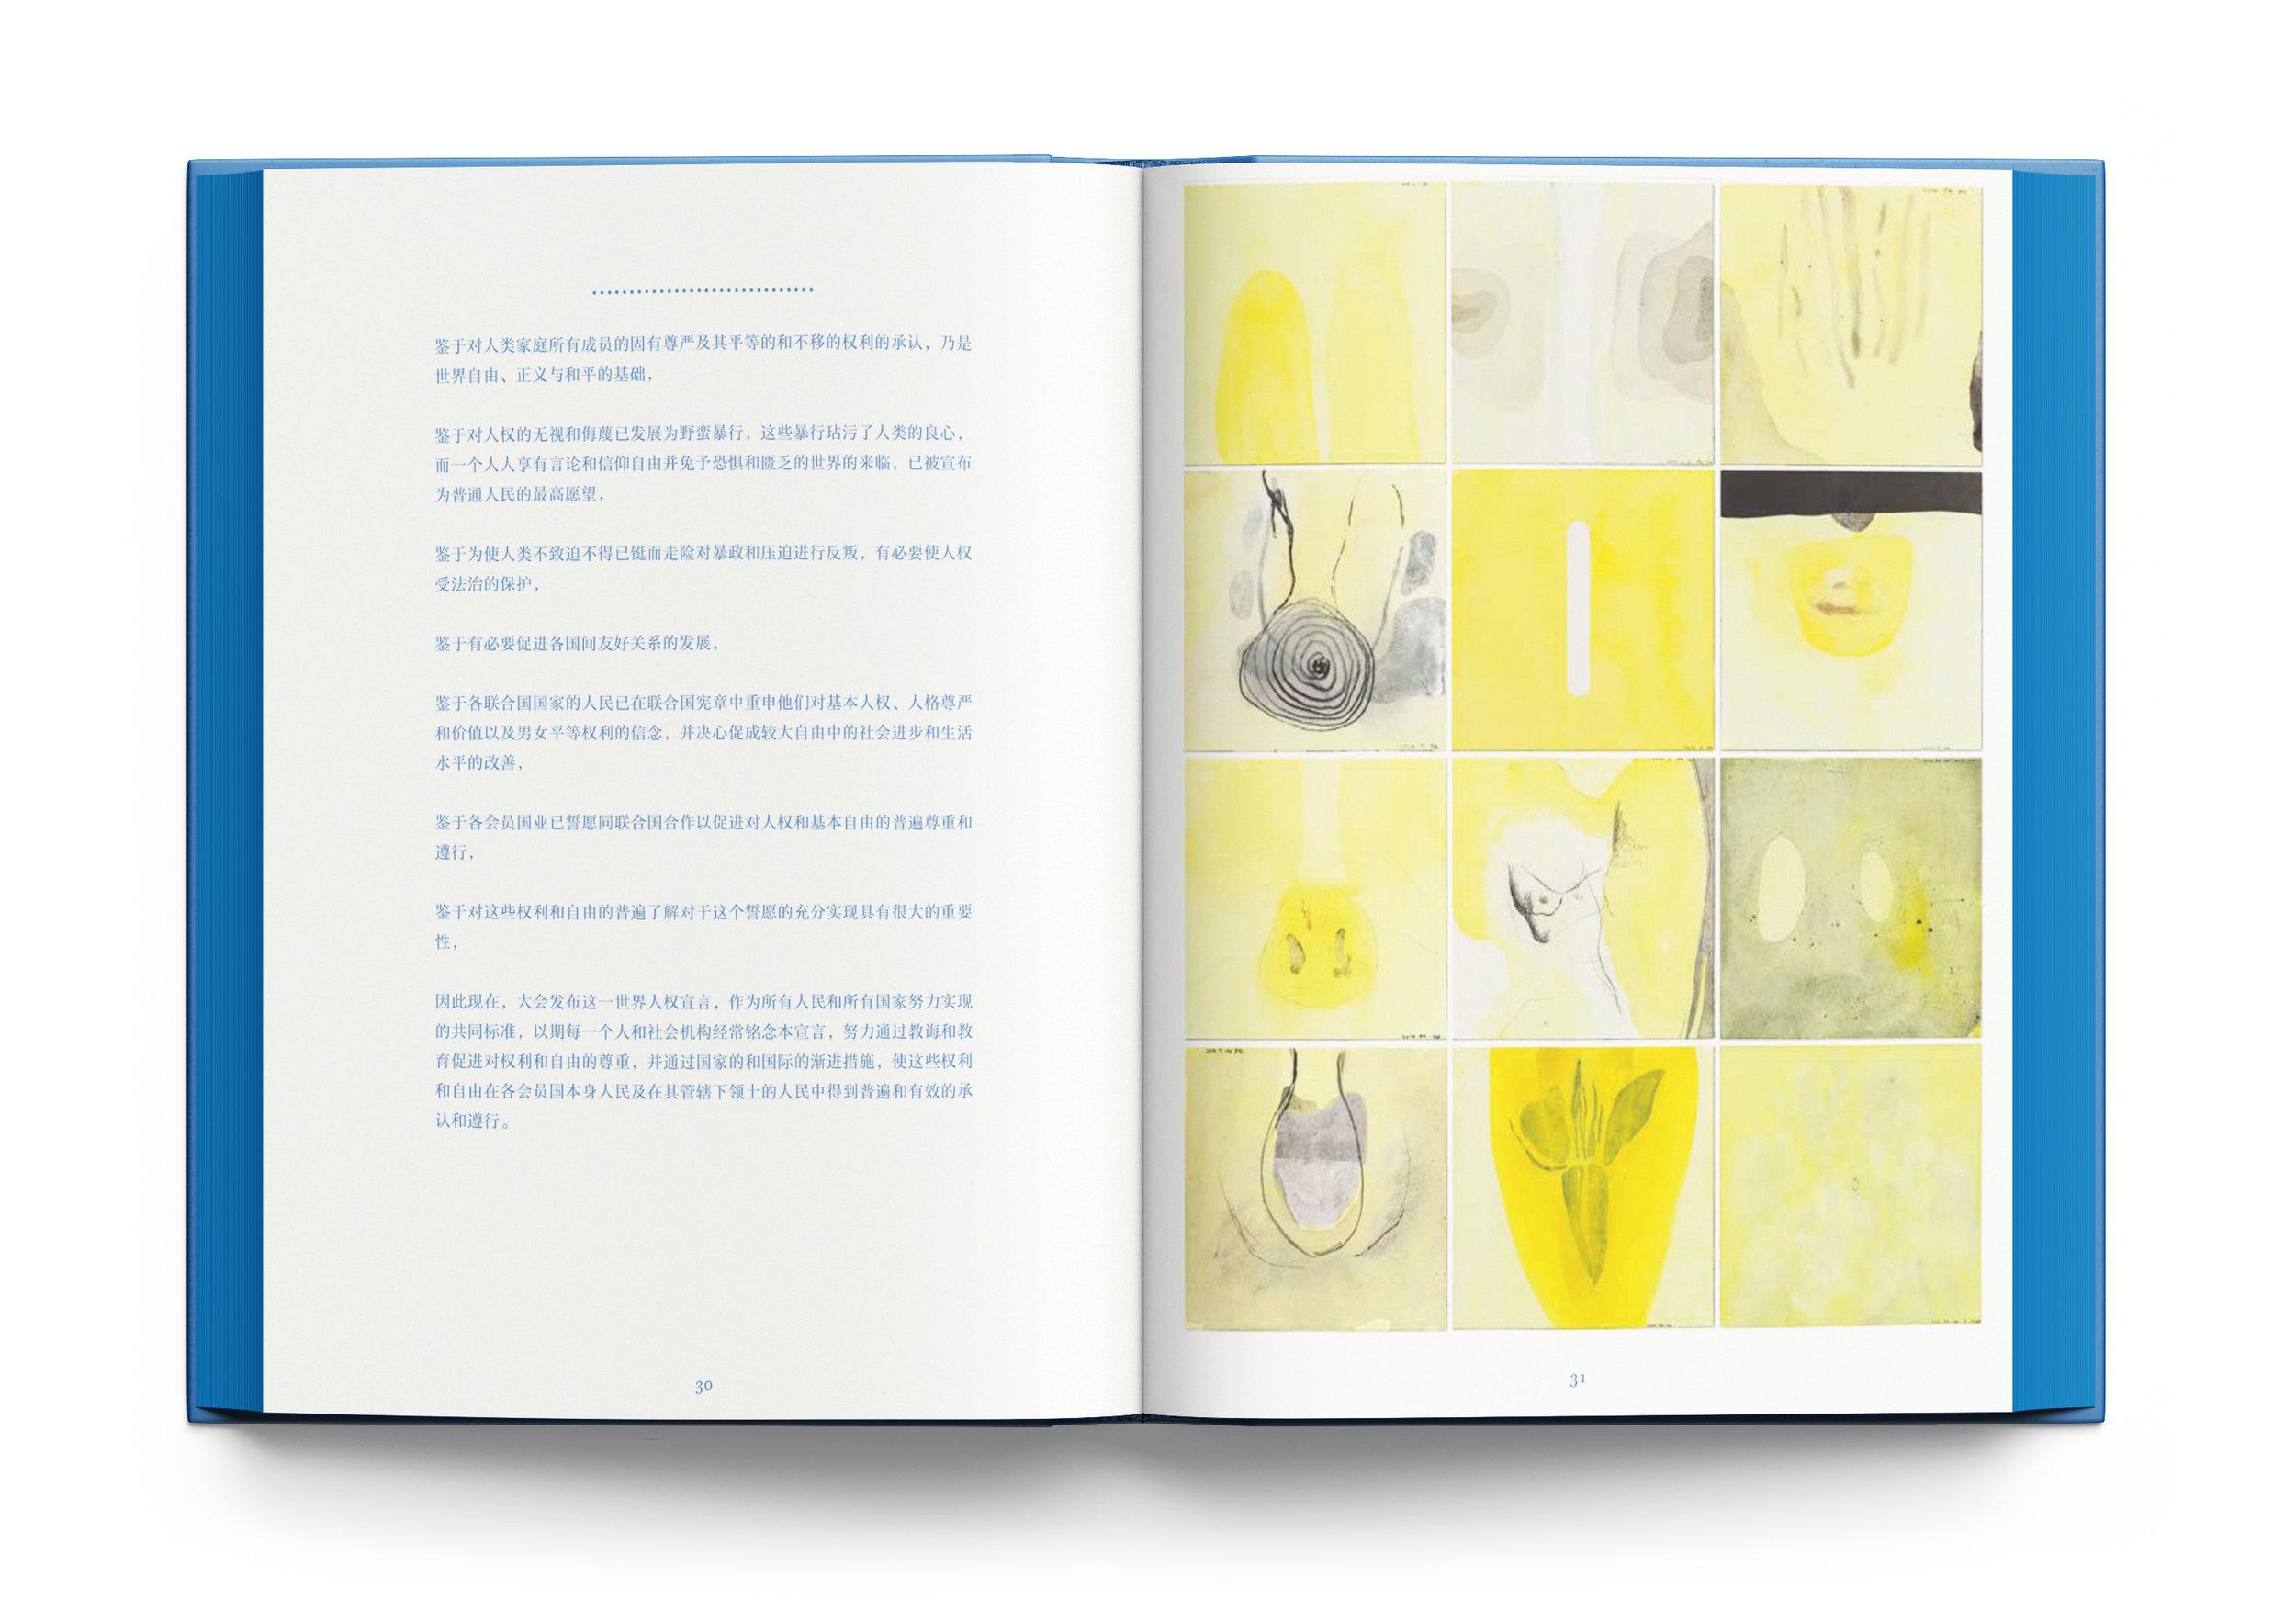 Buch_008.jpg